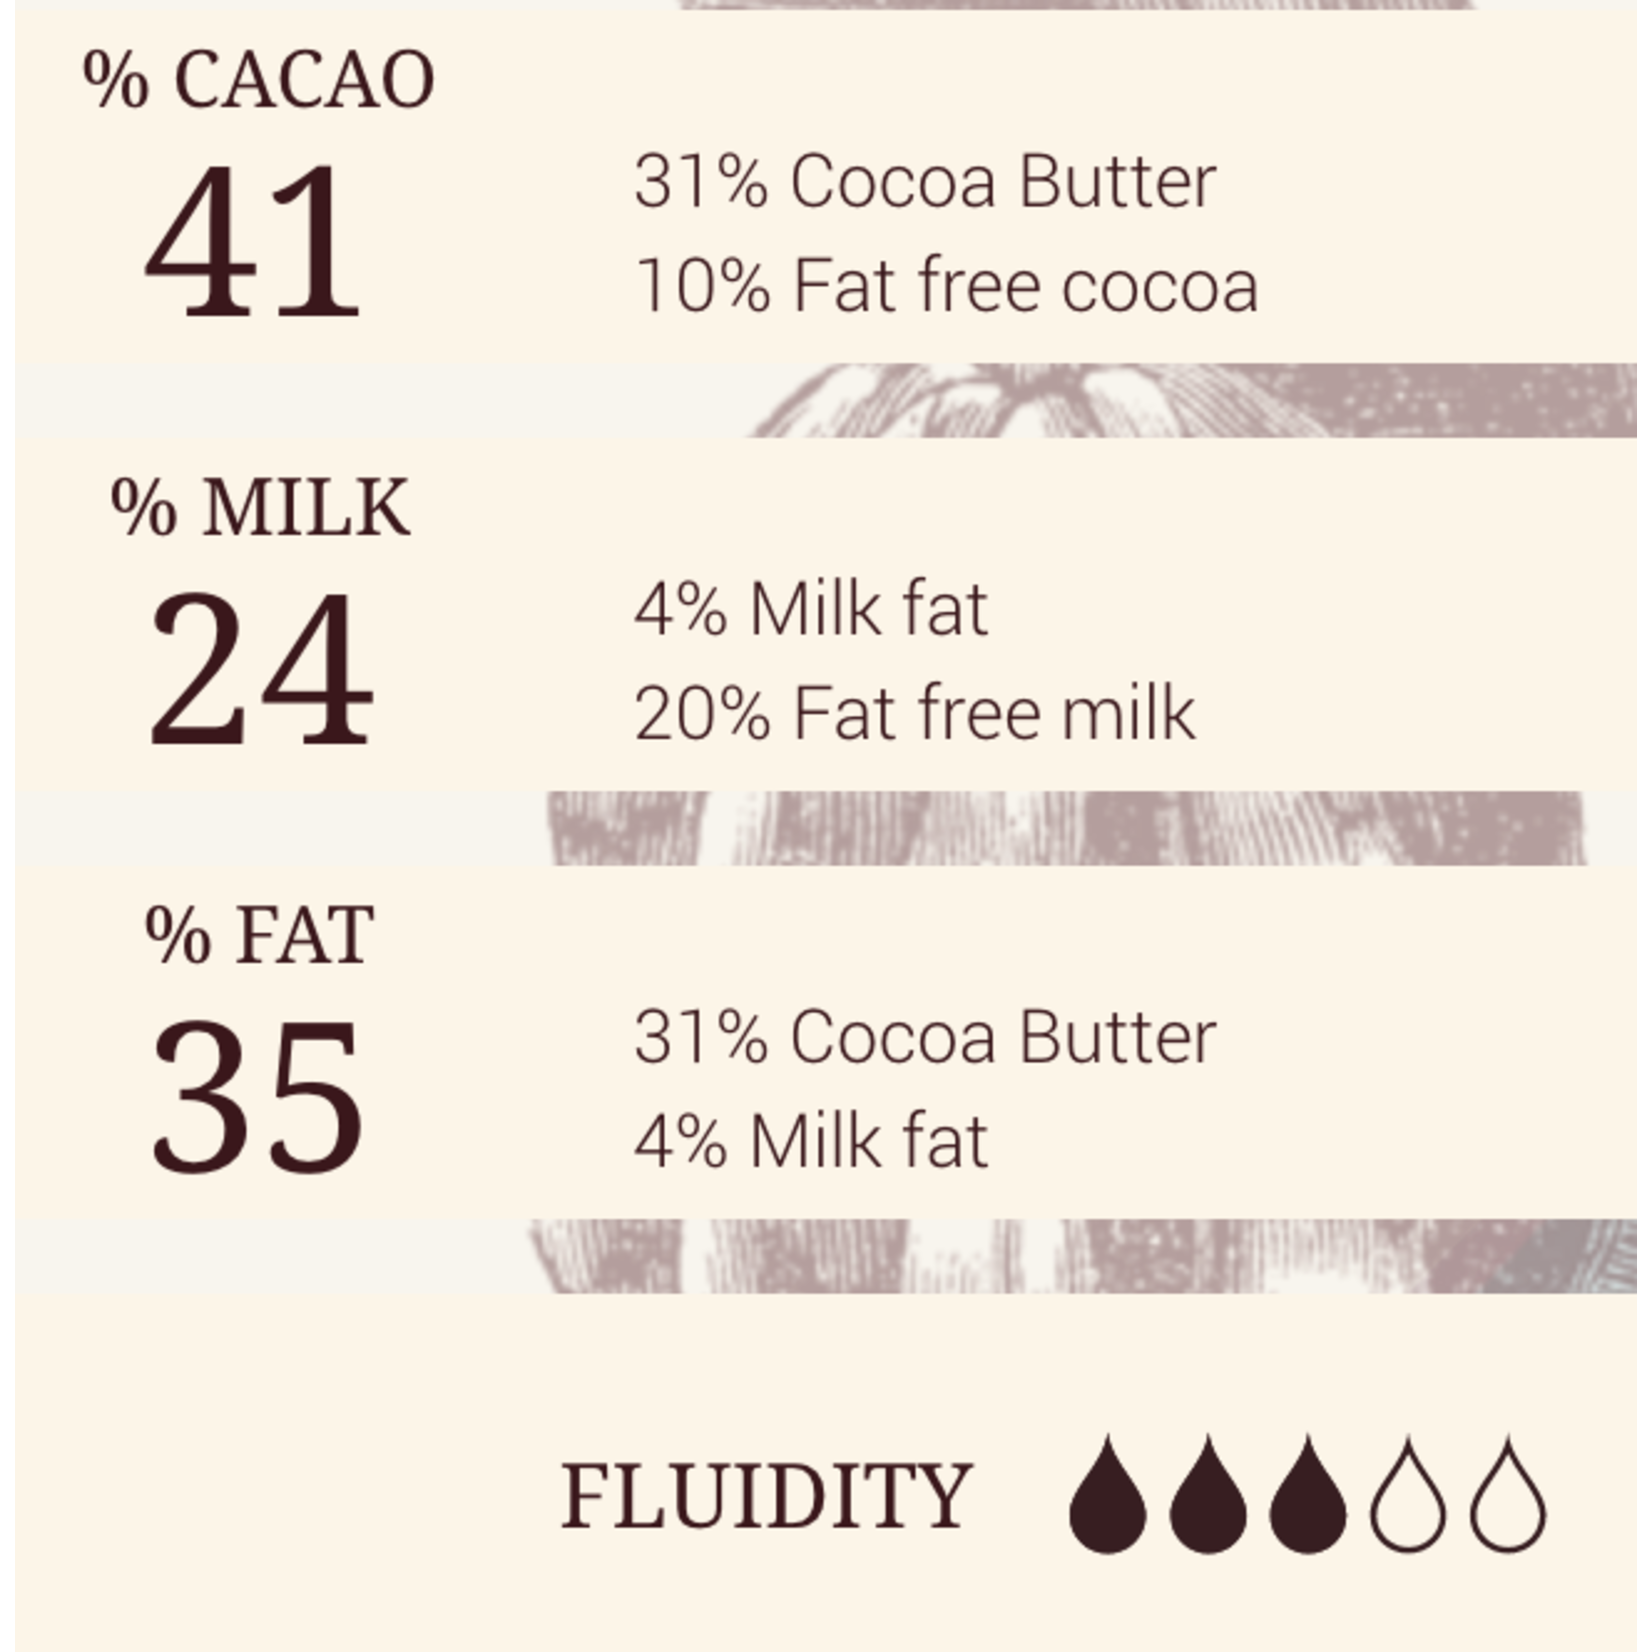 Cacao Barry Cacao Barry - Alunga Milk Chocolate 41% - 1 lb, CHM-Q41ALUN-US-U77-R